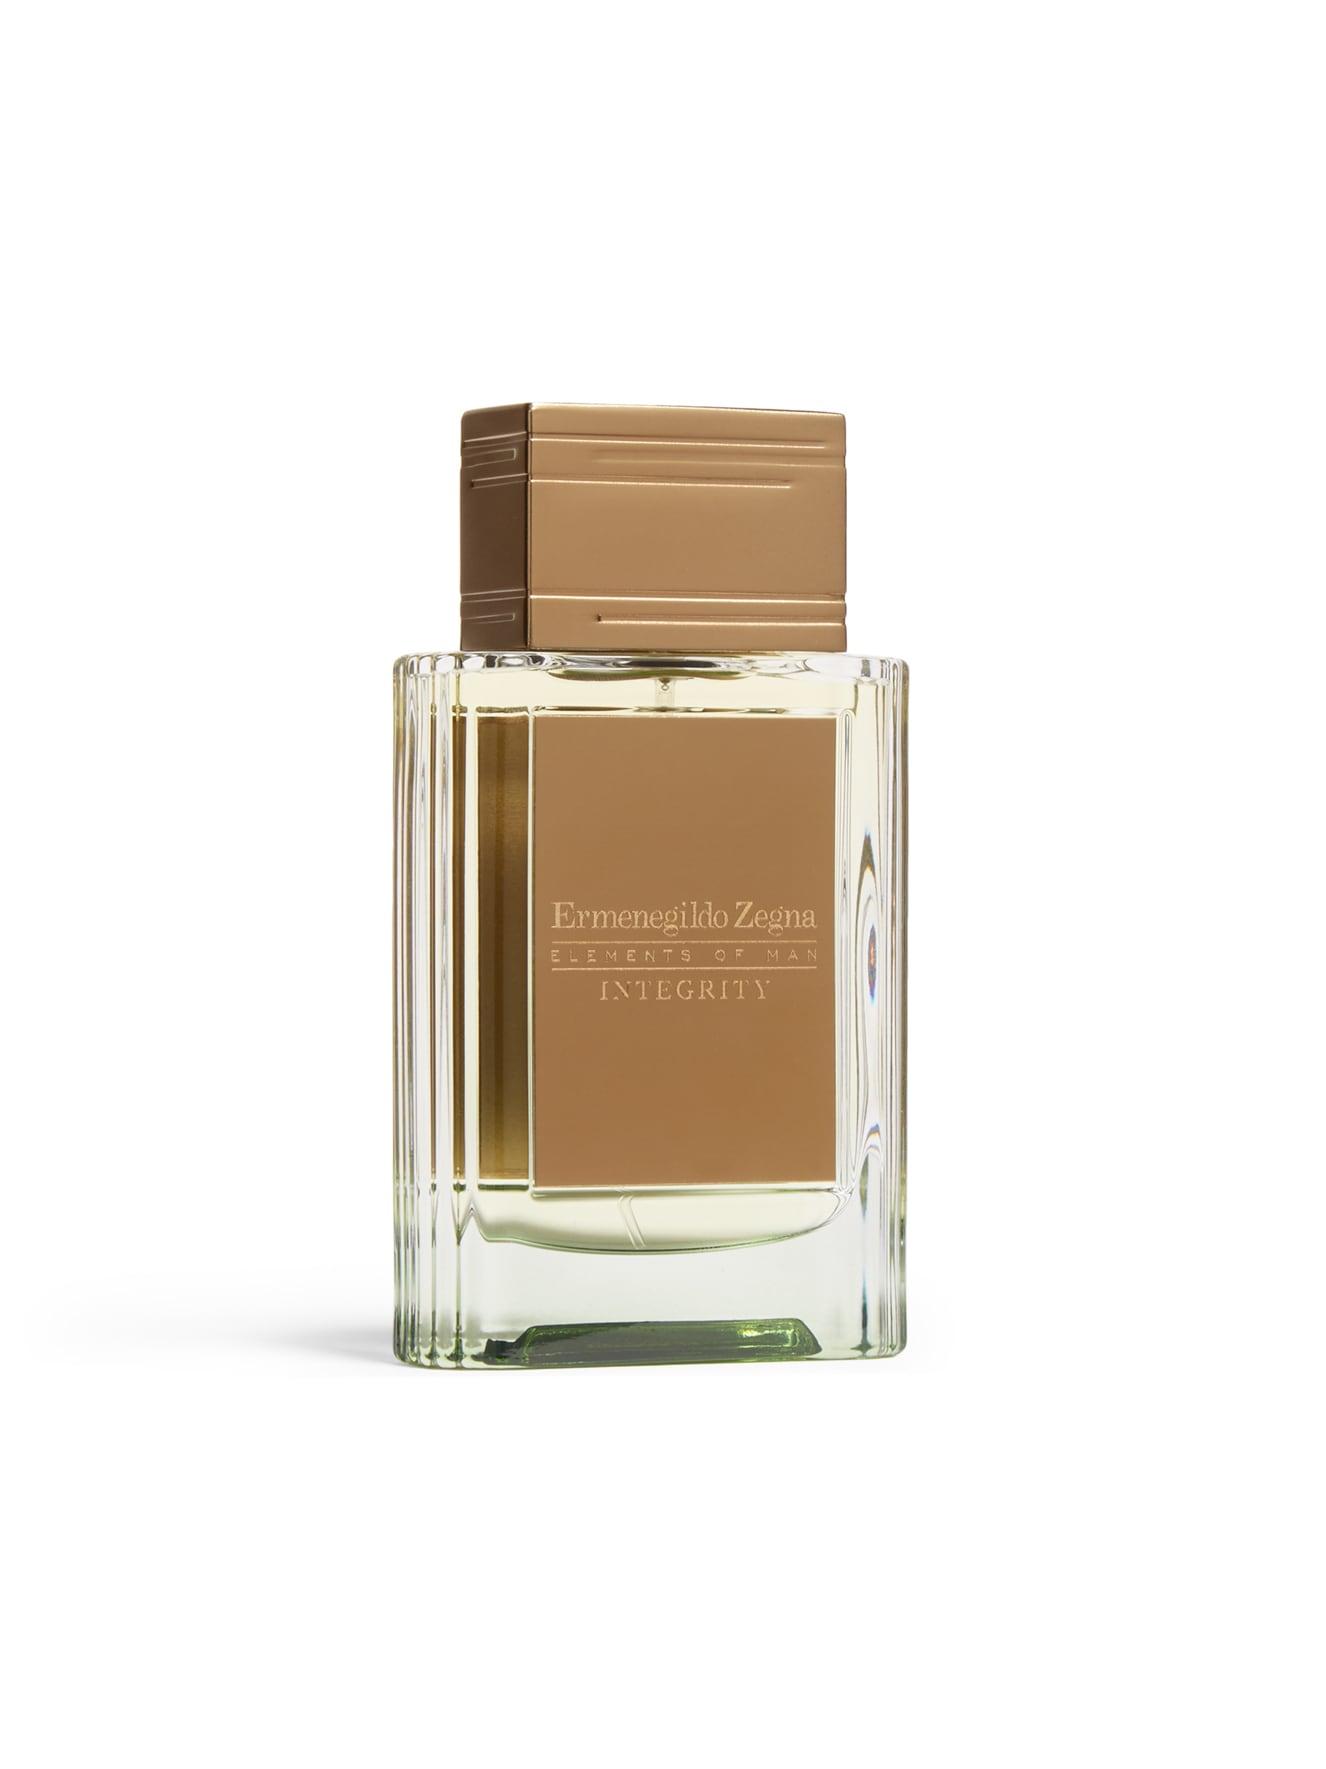 bdff8c11641 Integrity Ermenegildo Zegna cologne - a new fragrance for men 2017